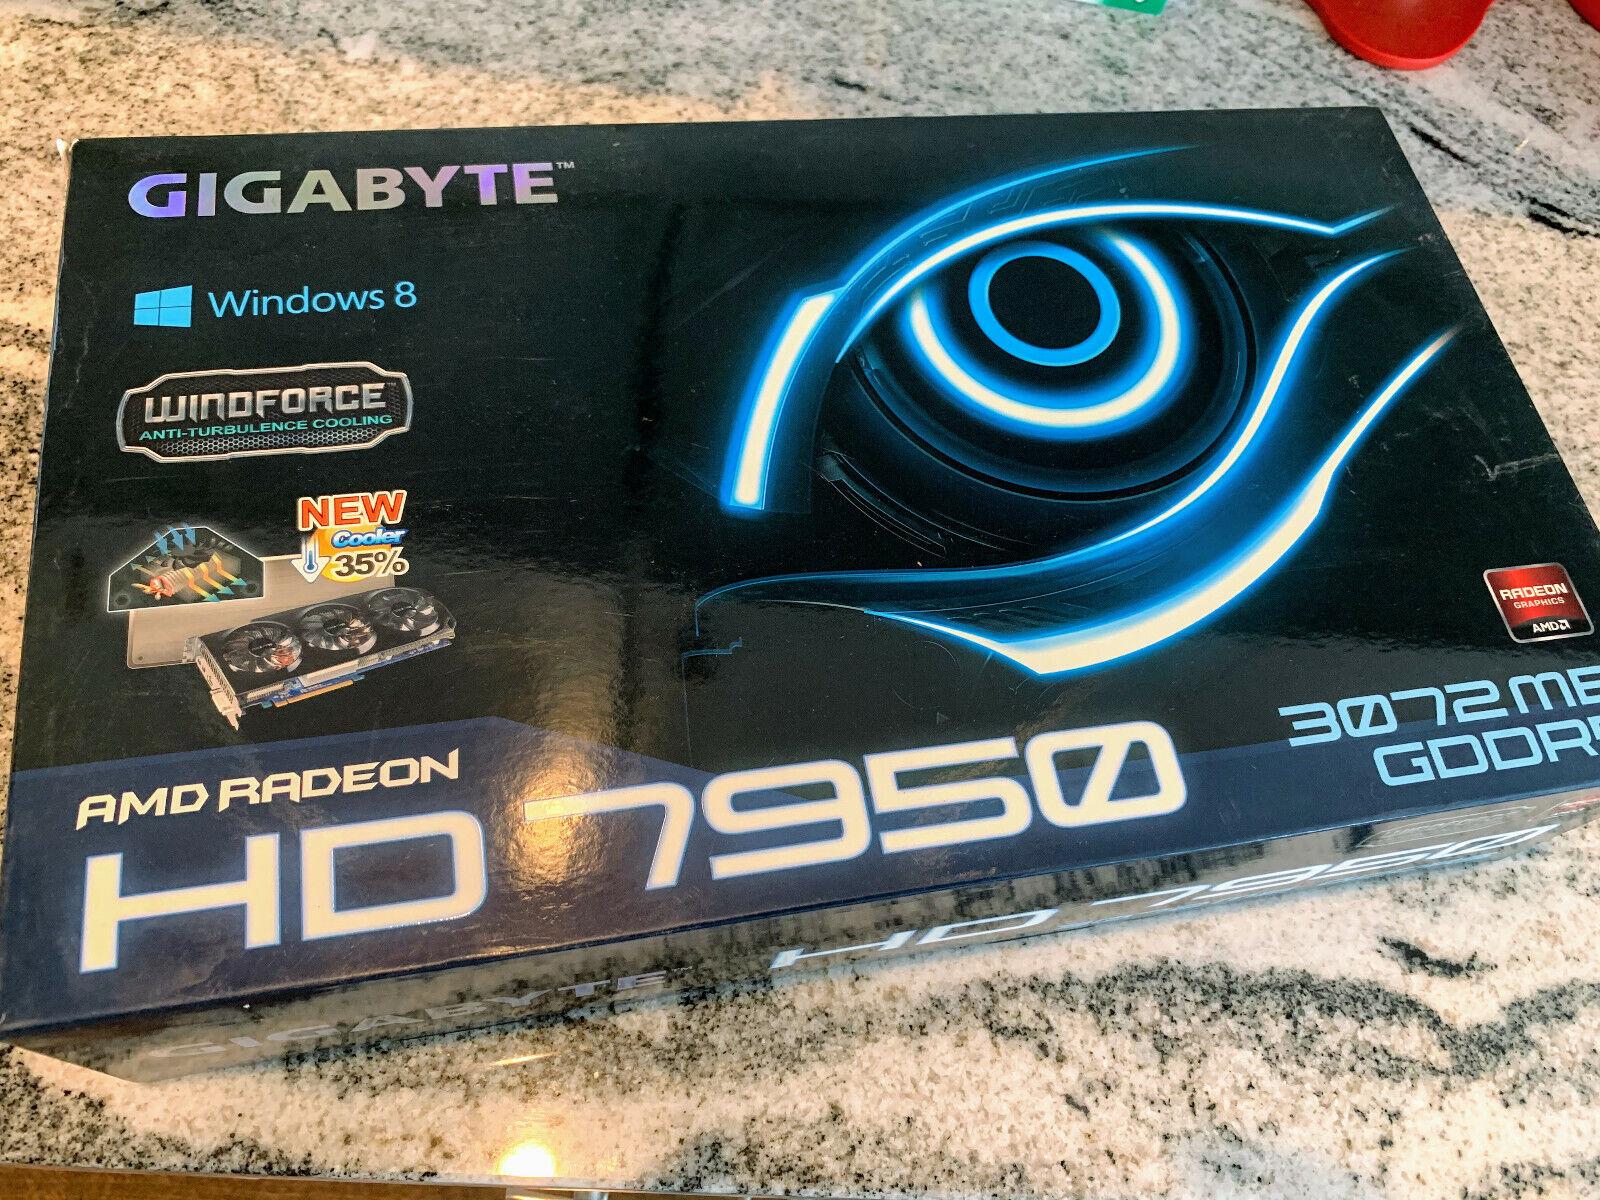 Gigabyte HD 7950 3GB AMD Radeon CrossFire Support Hackintosh Windows 10